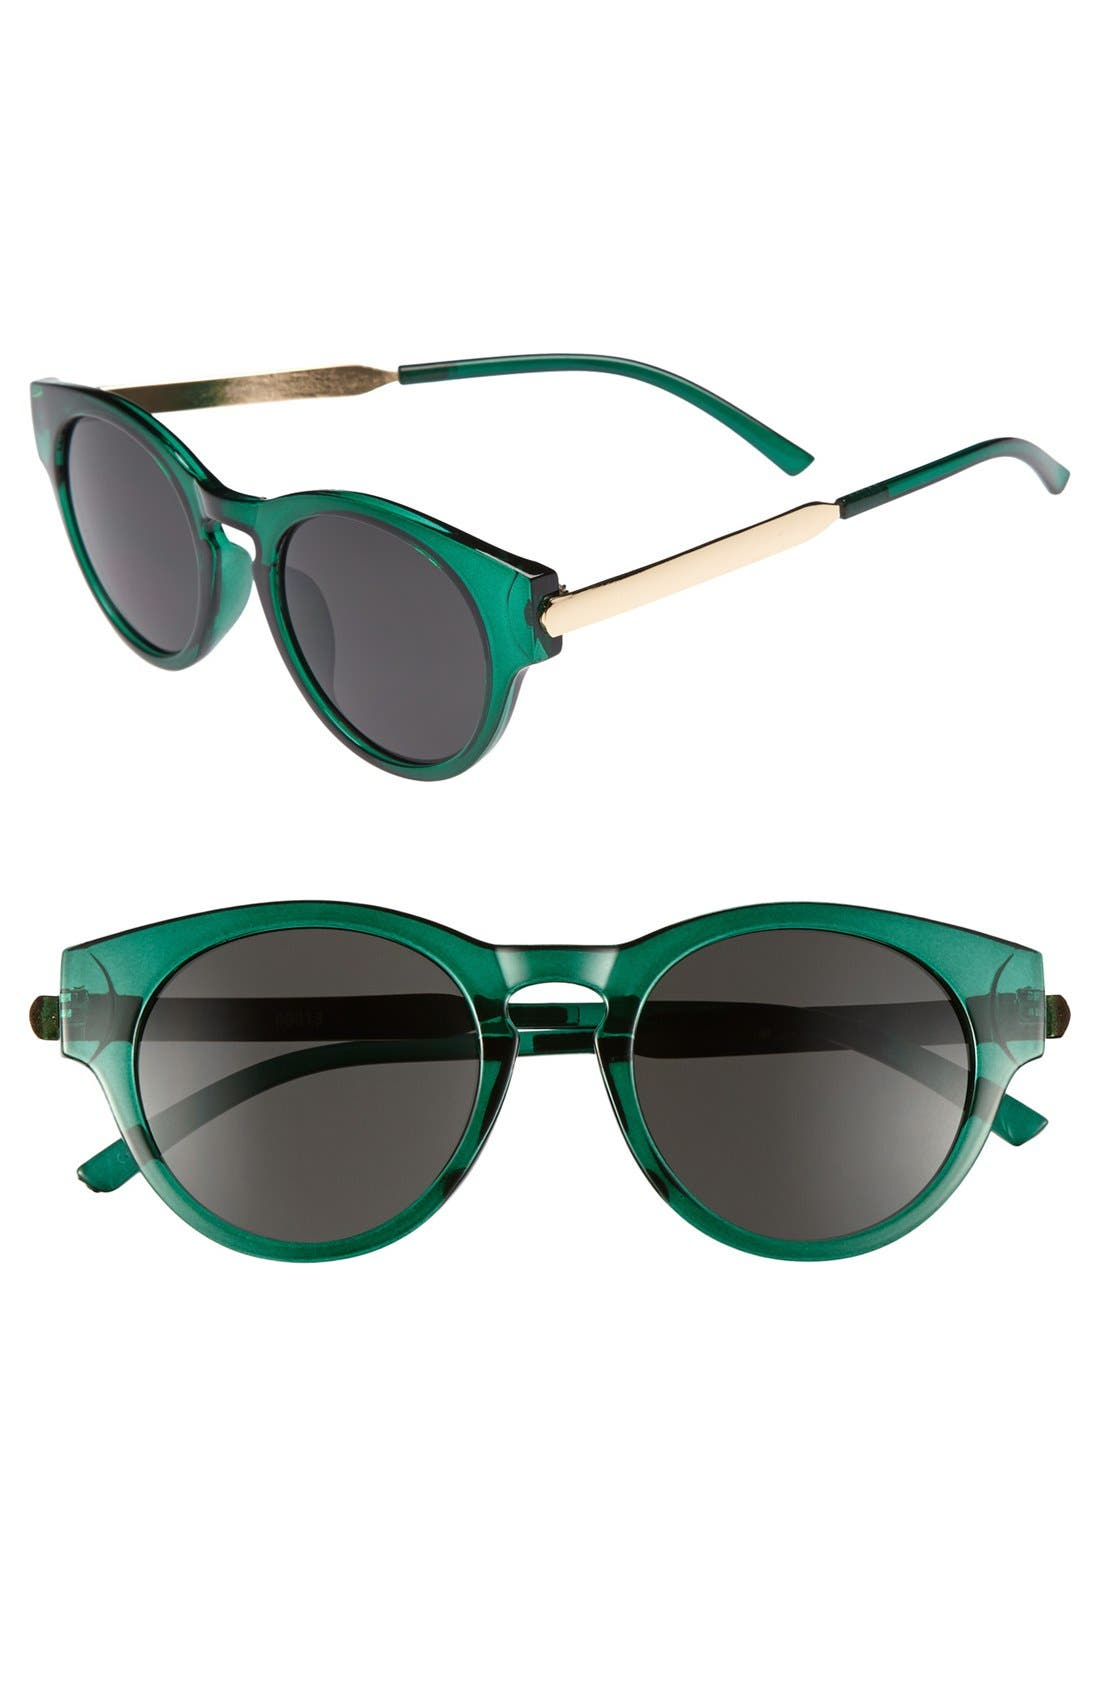 Main Image - A.J. Morgan 48mm Retro Sunglasses